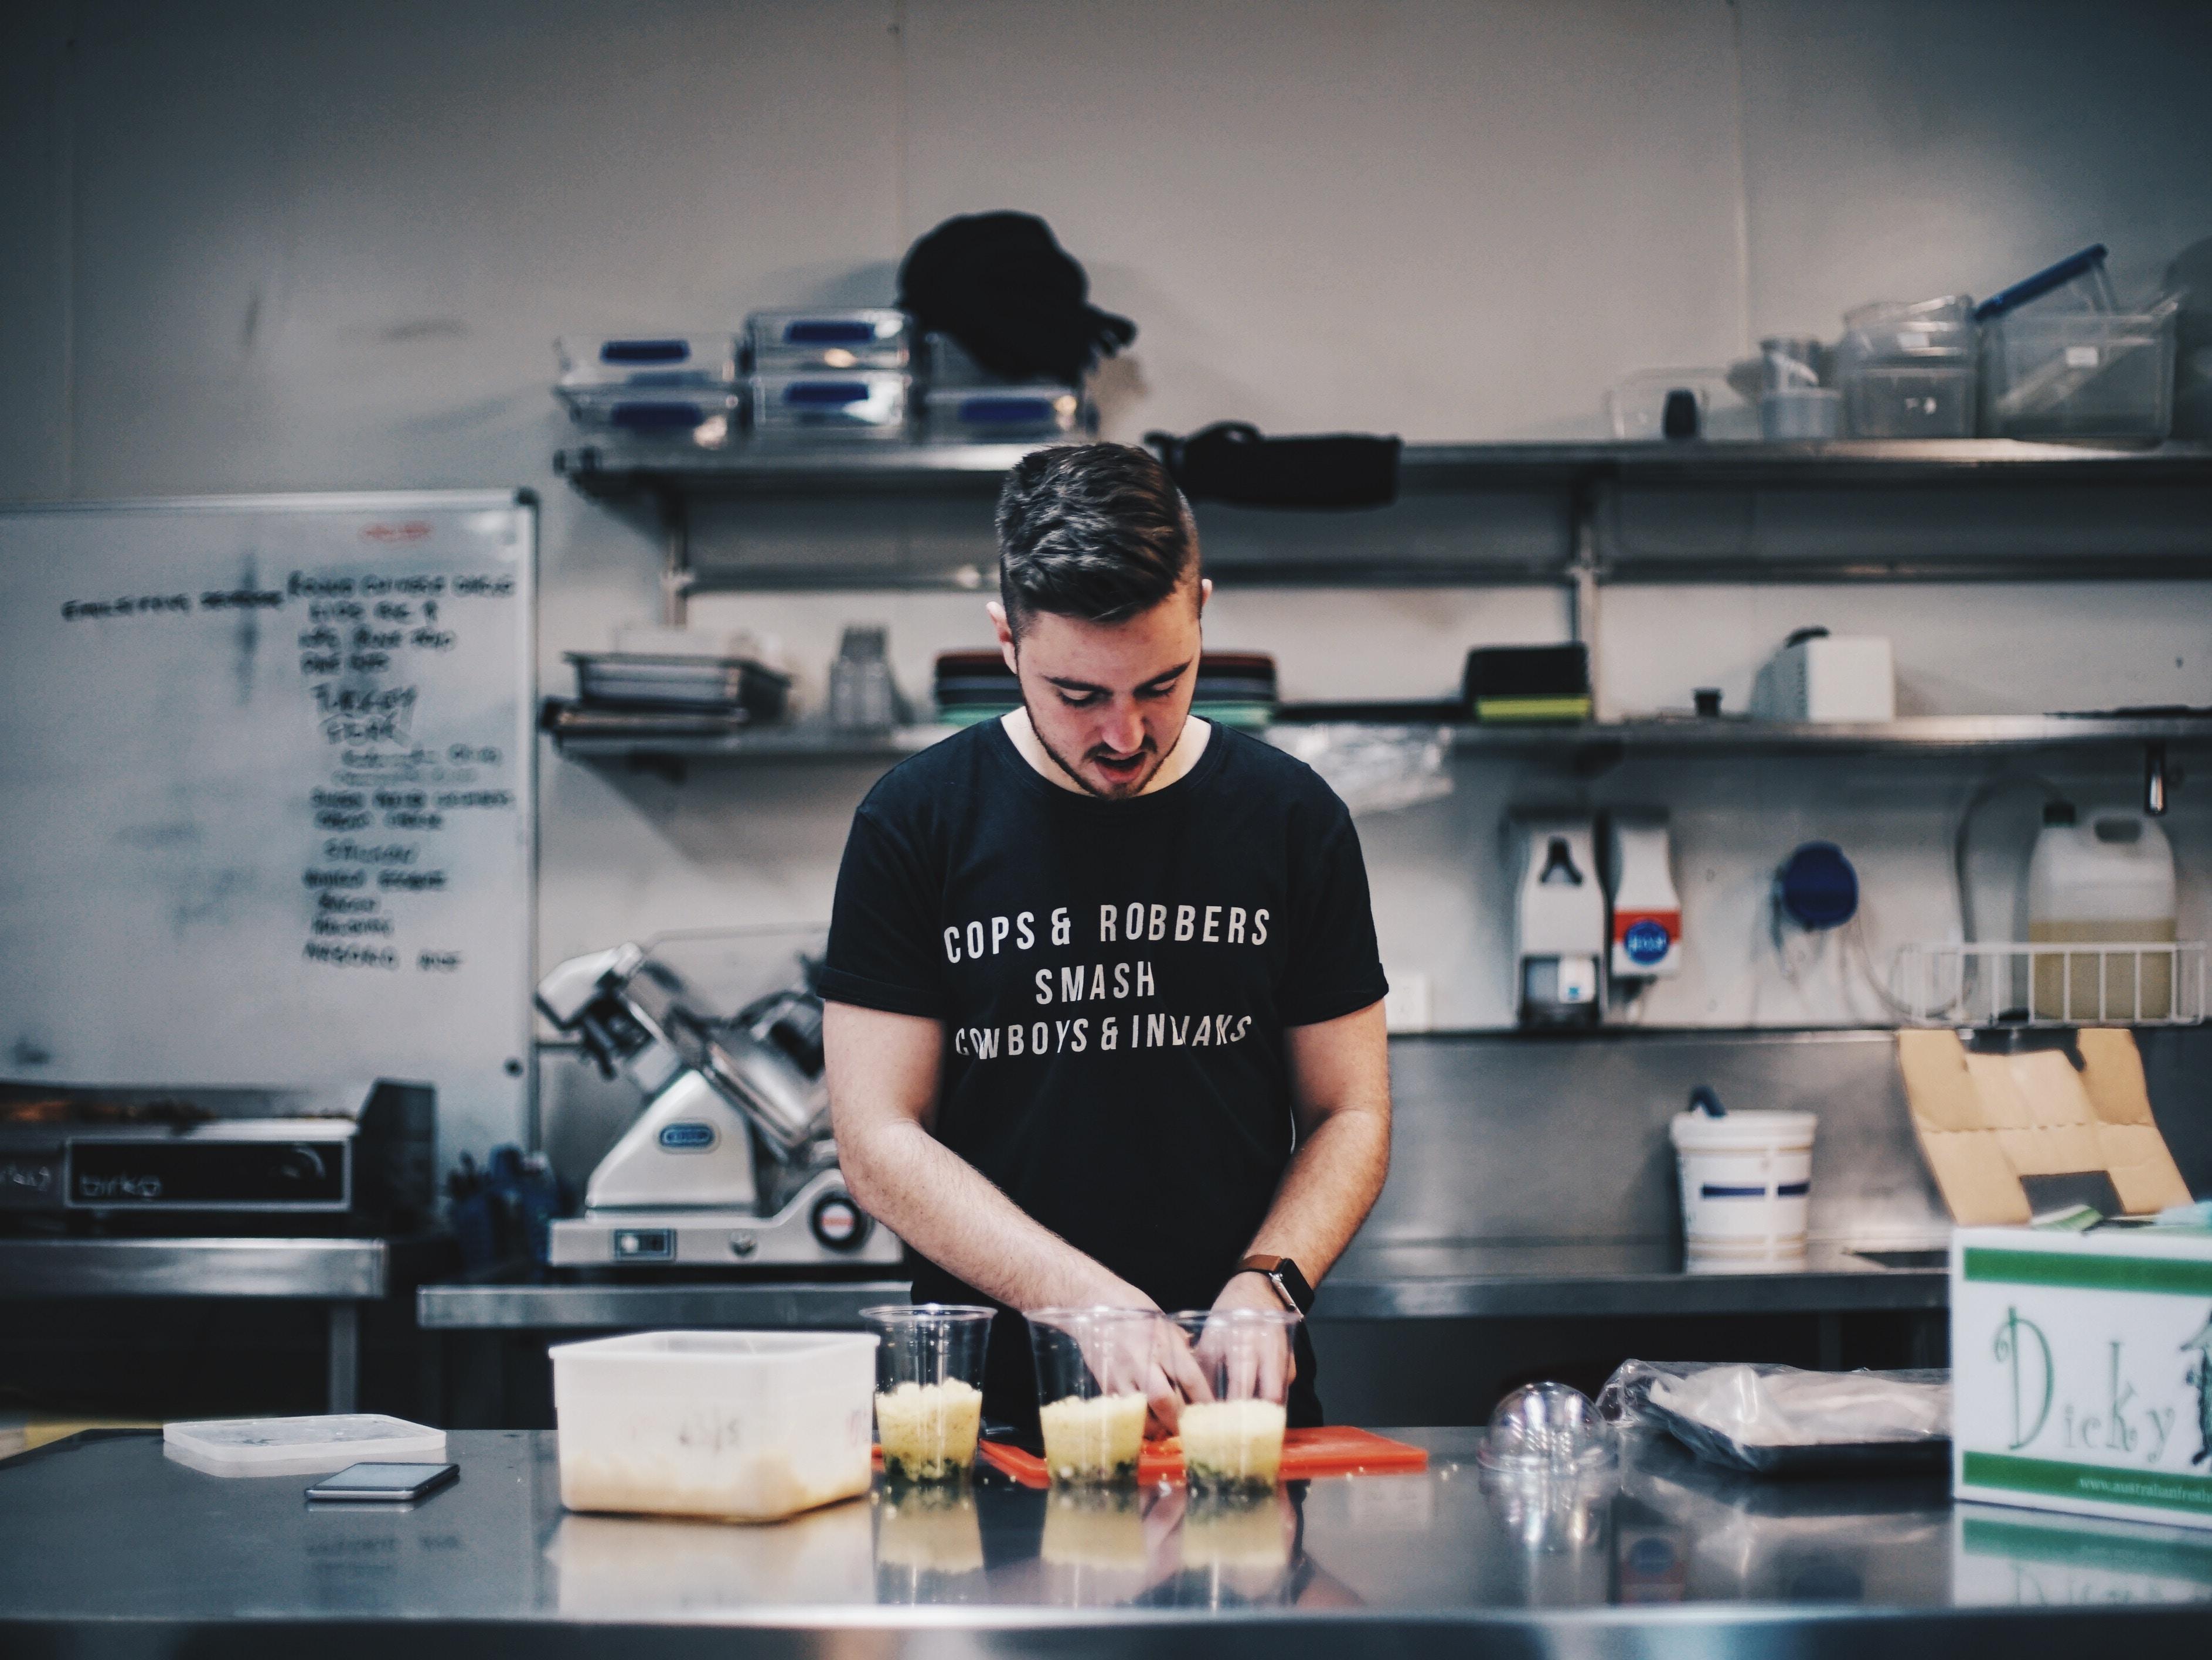 A man in a black t-shirt preparing food in a restaurant